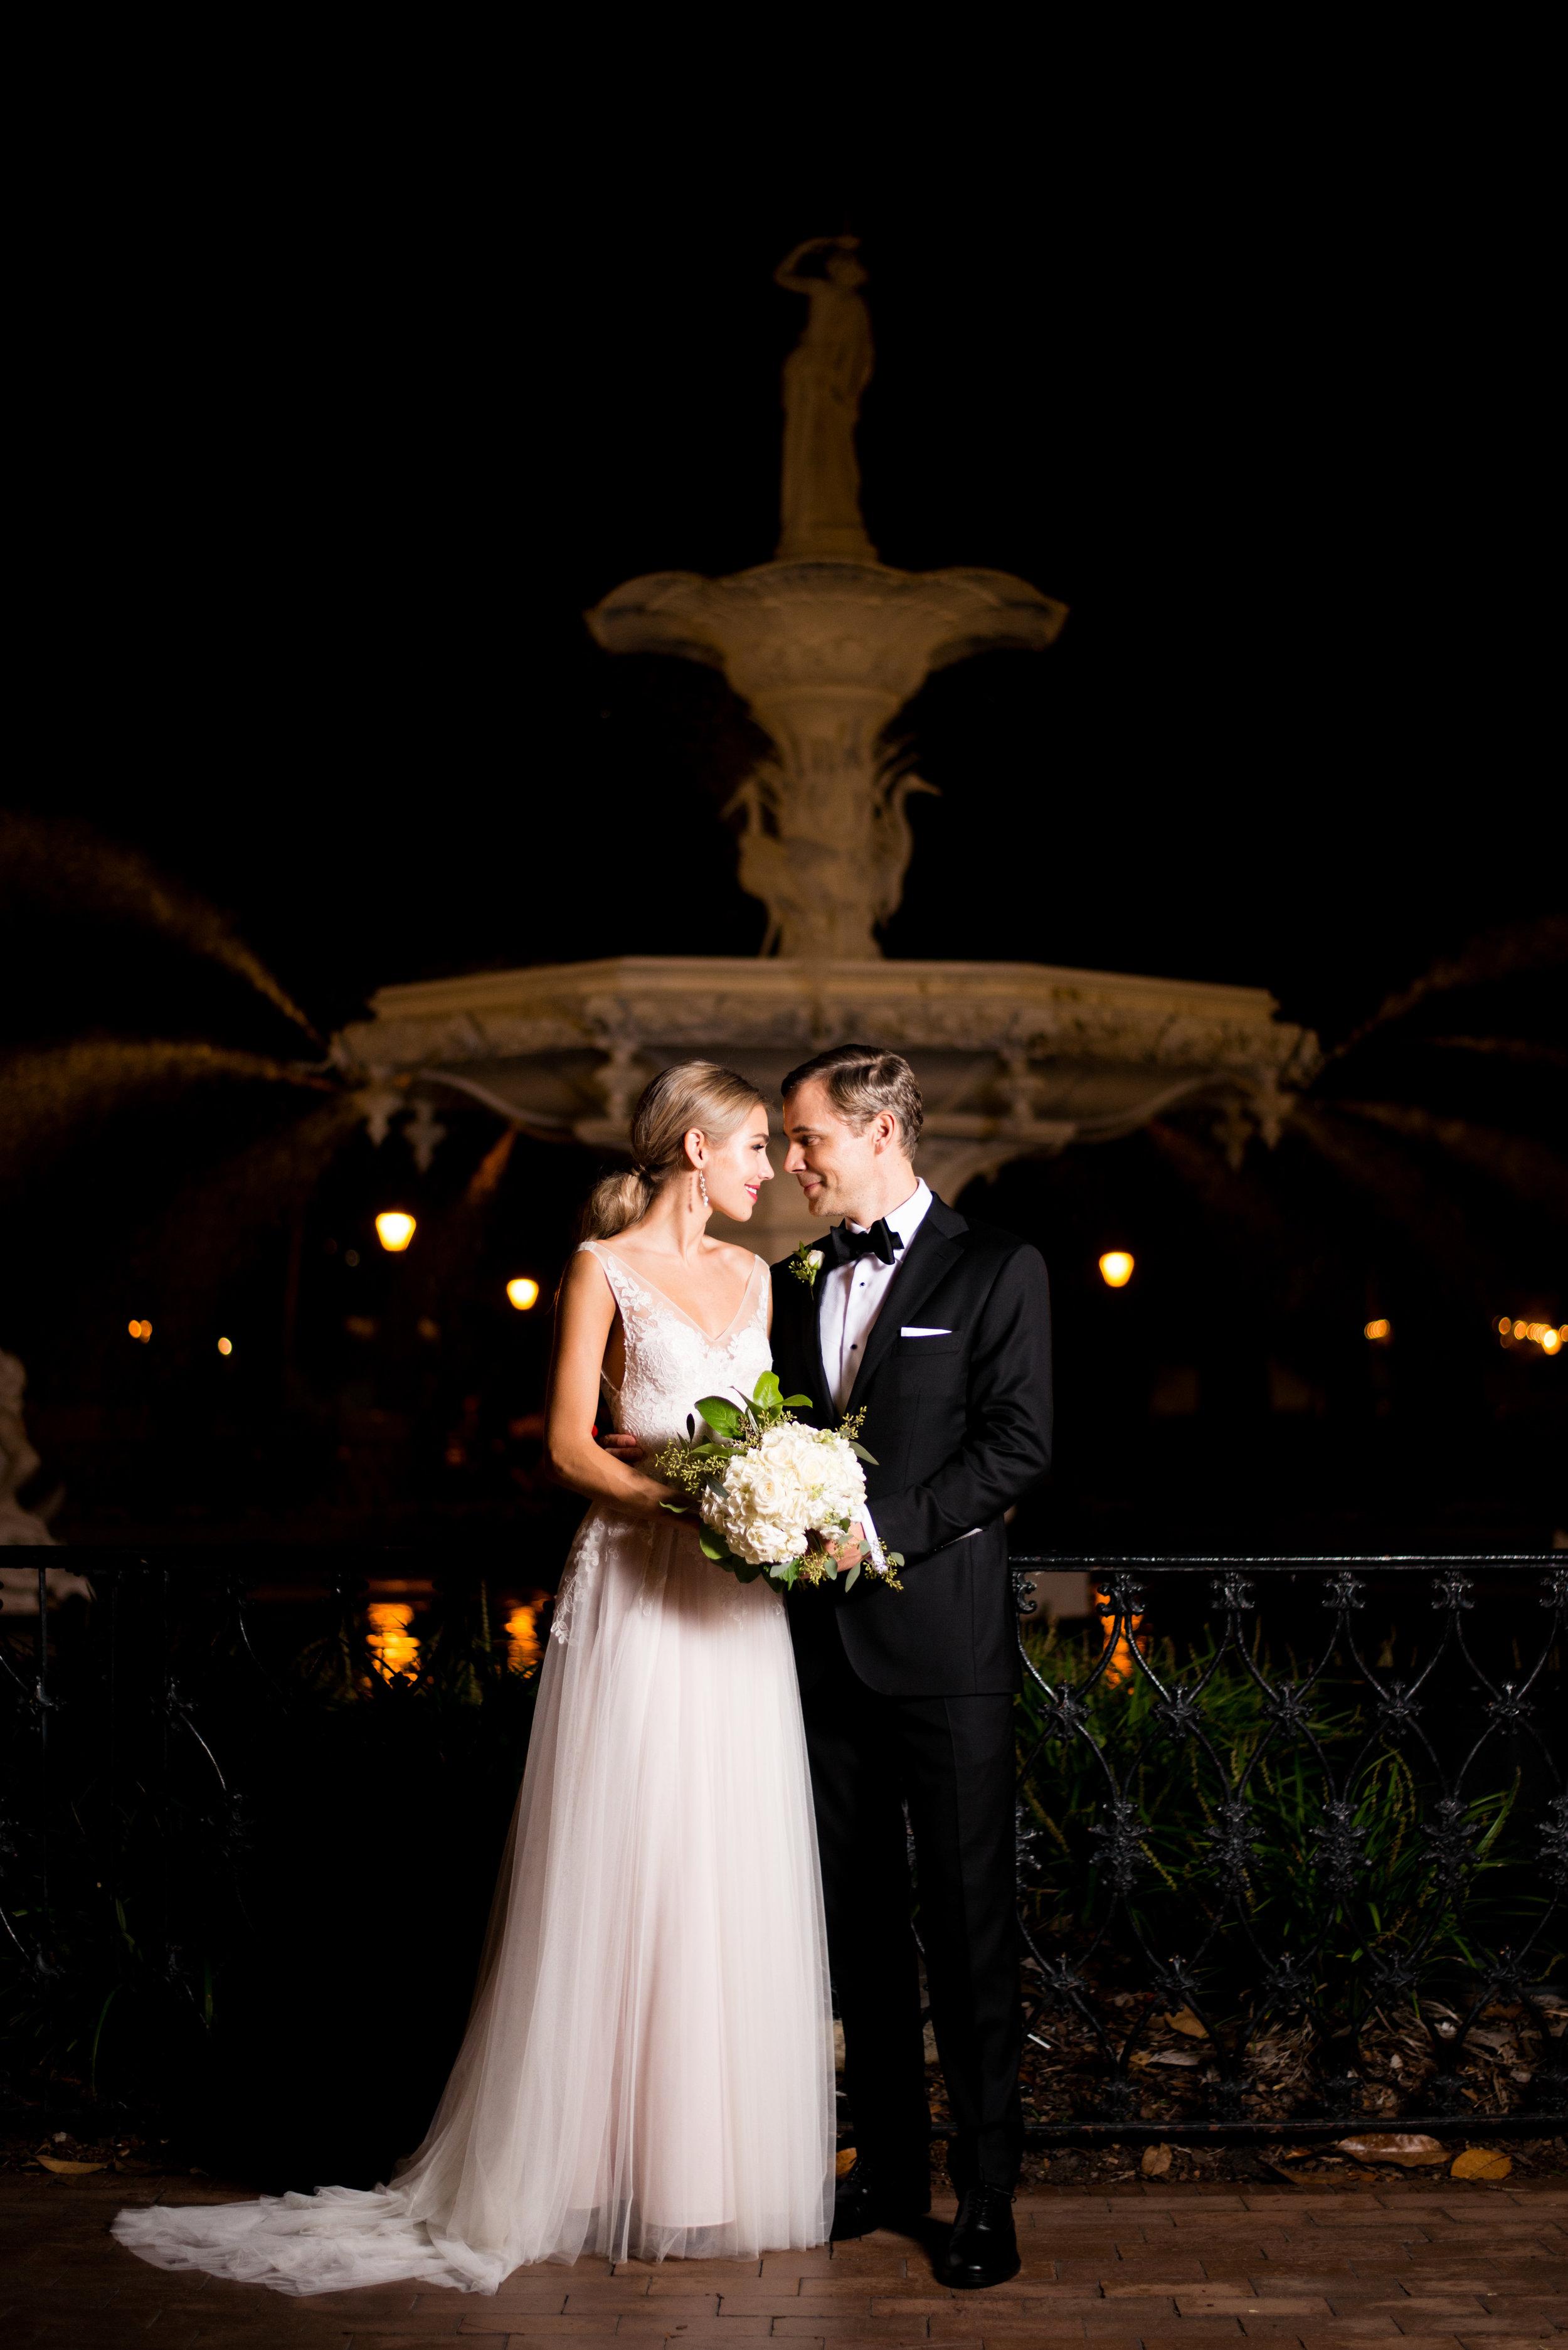 CLASSIC WEDDING IN SAVANNAH